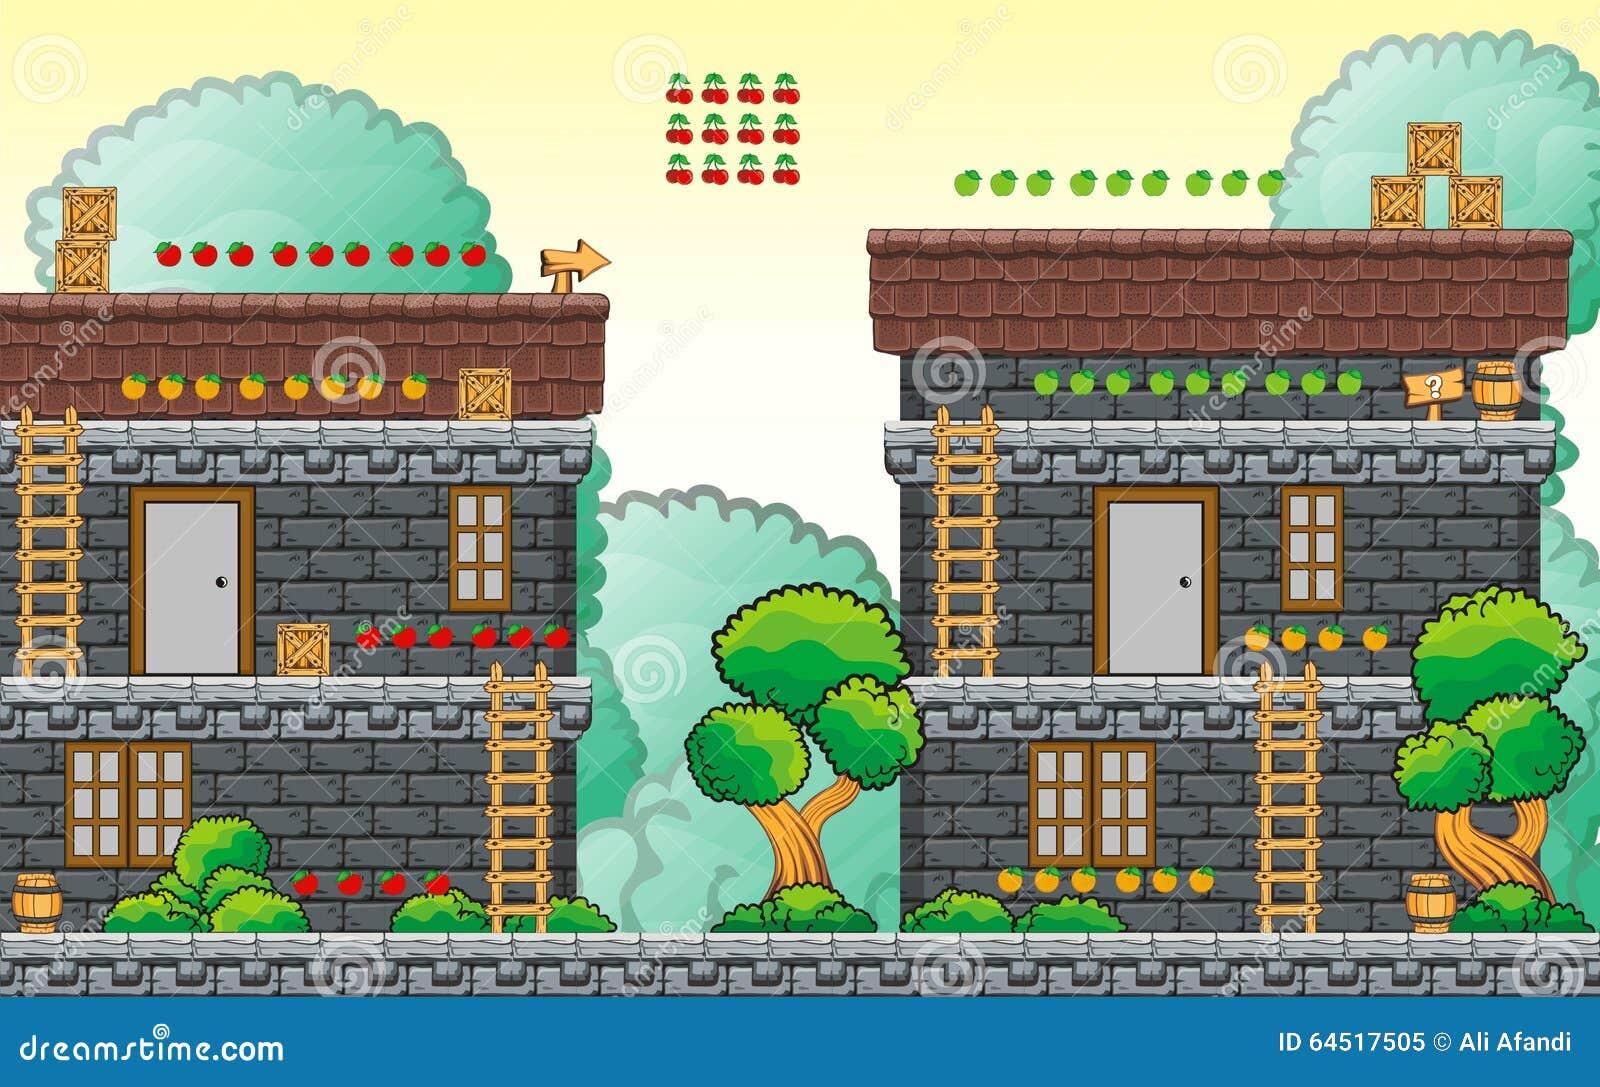 Game Tiles